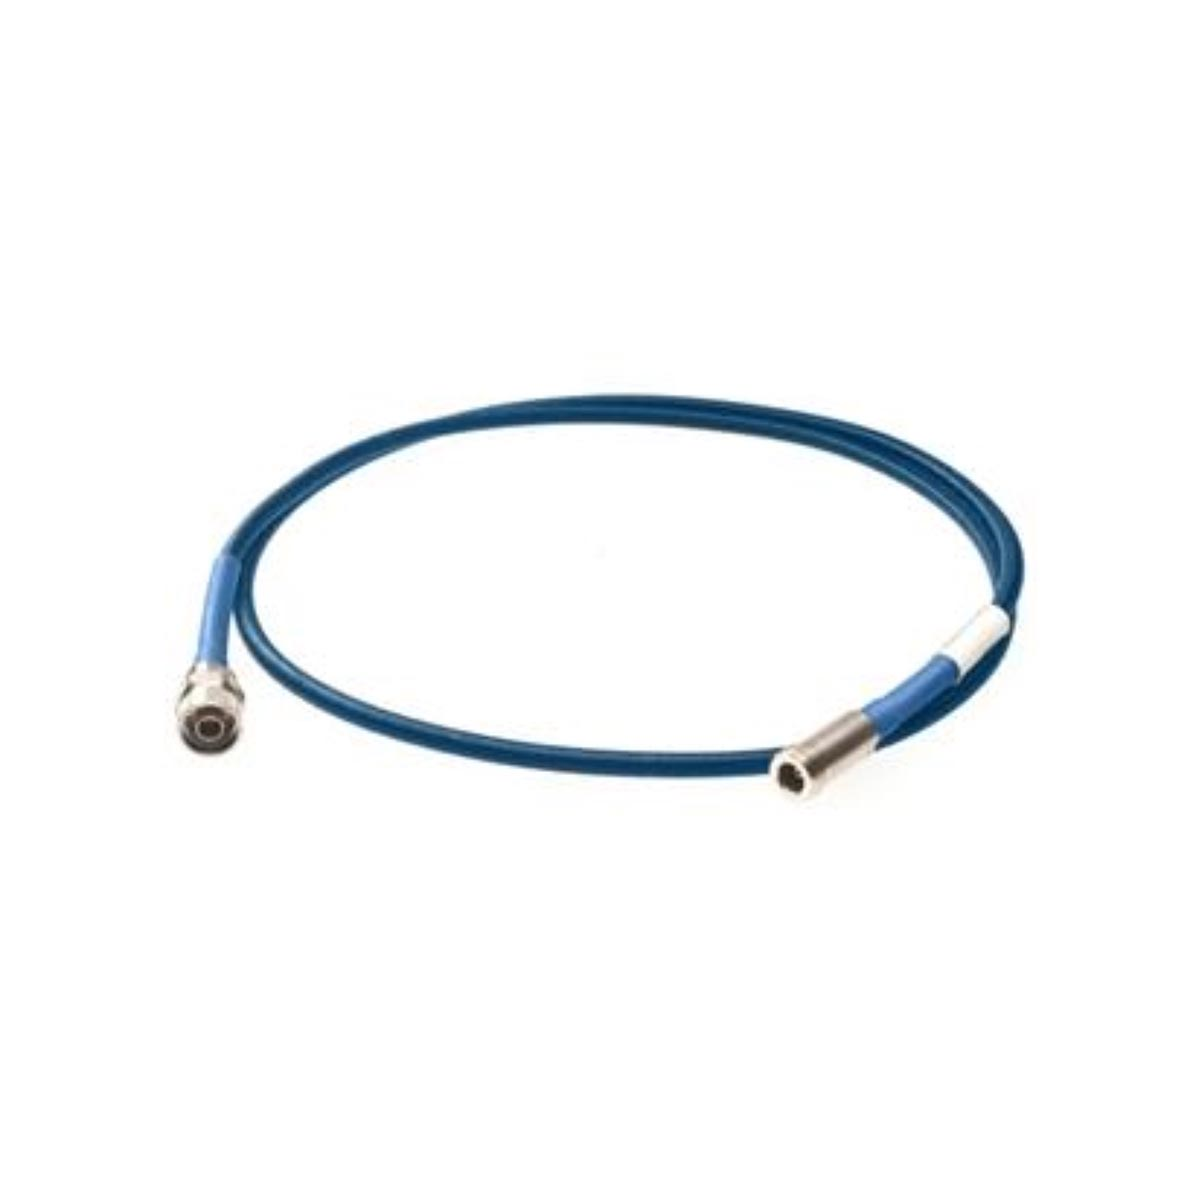 Cables de prueba RF Bird RF TC-MNFN-1-5 DC-6 GHz